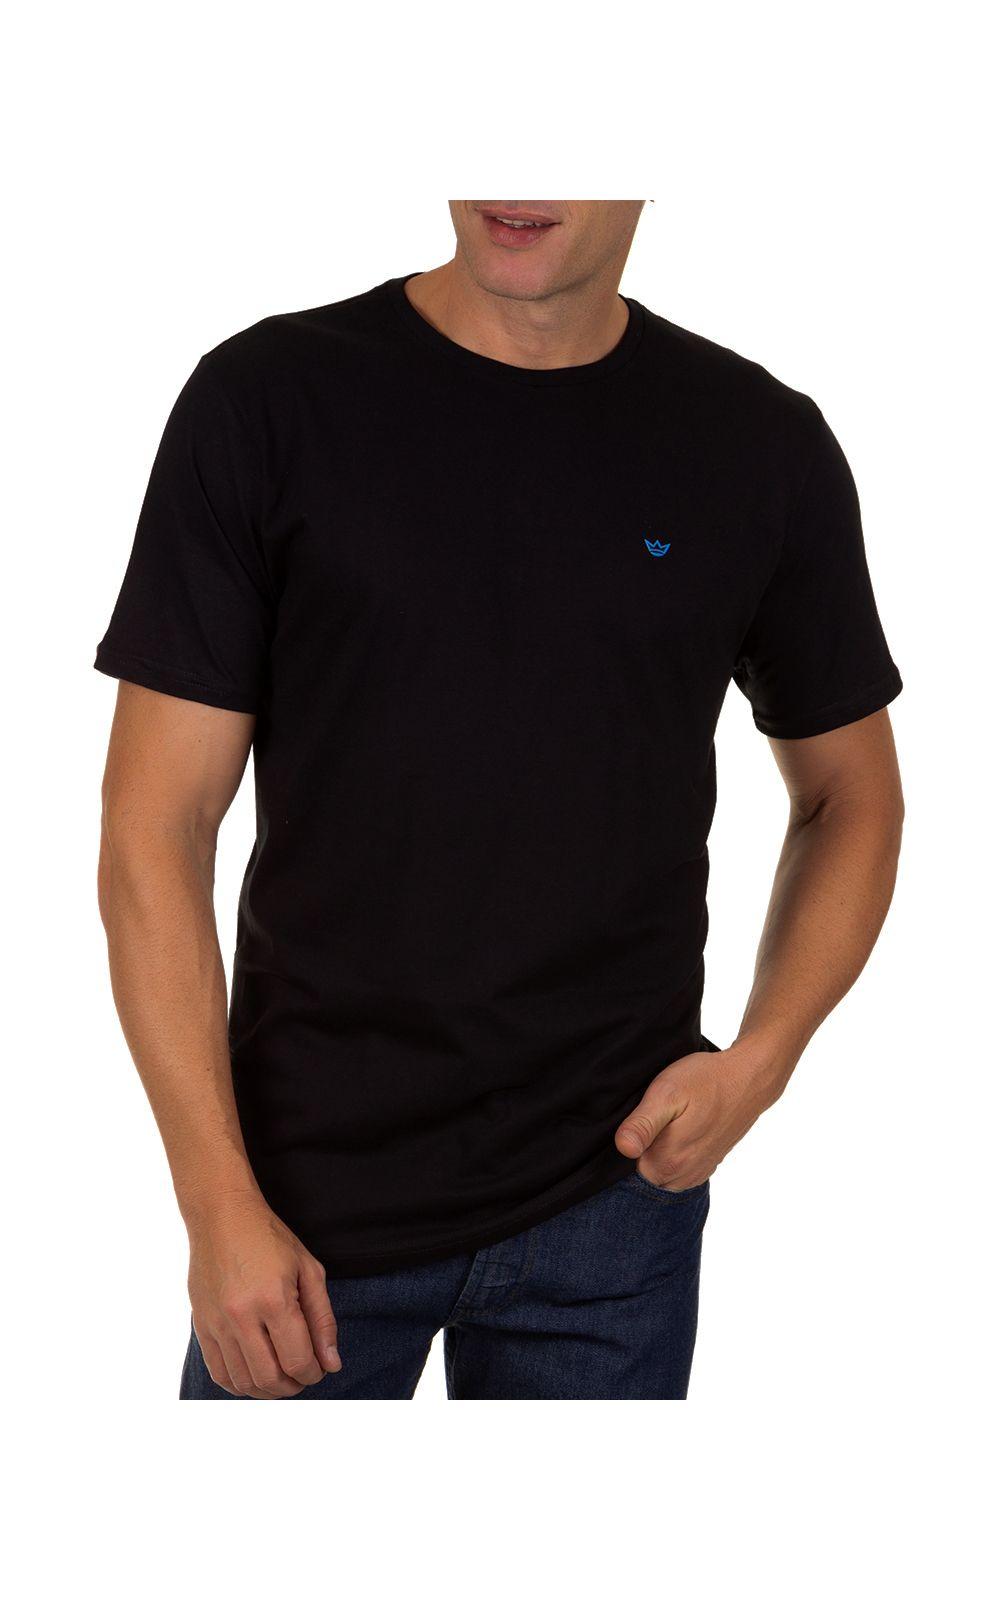 Foto 1 - Camiseta Masculina Preto Lisa